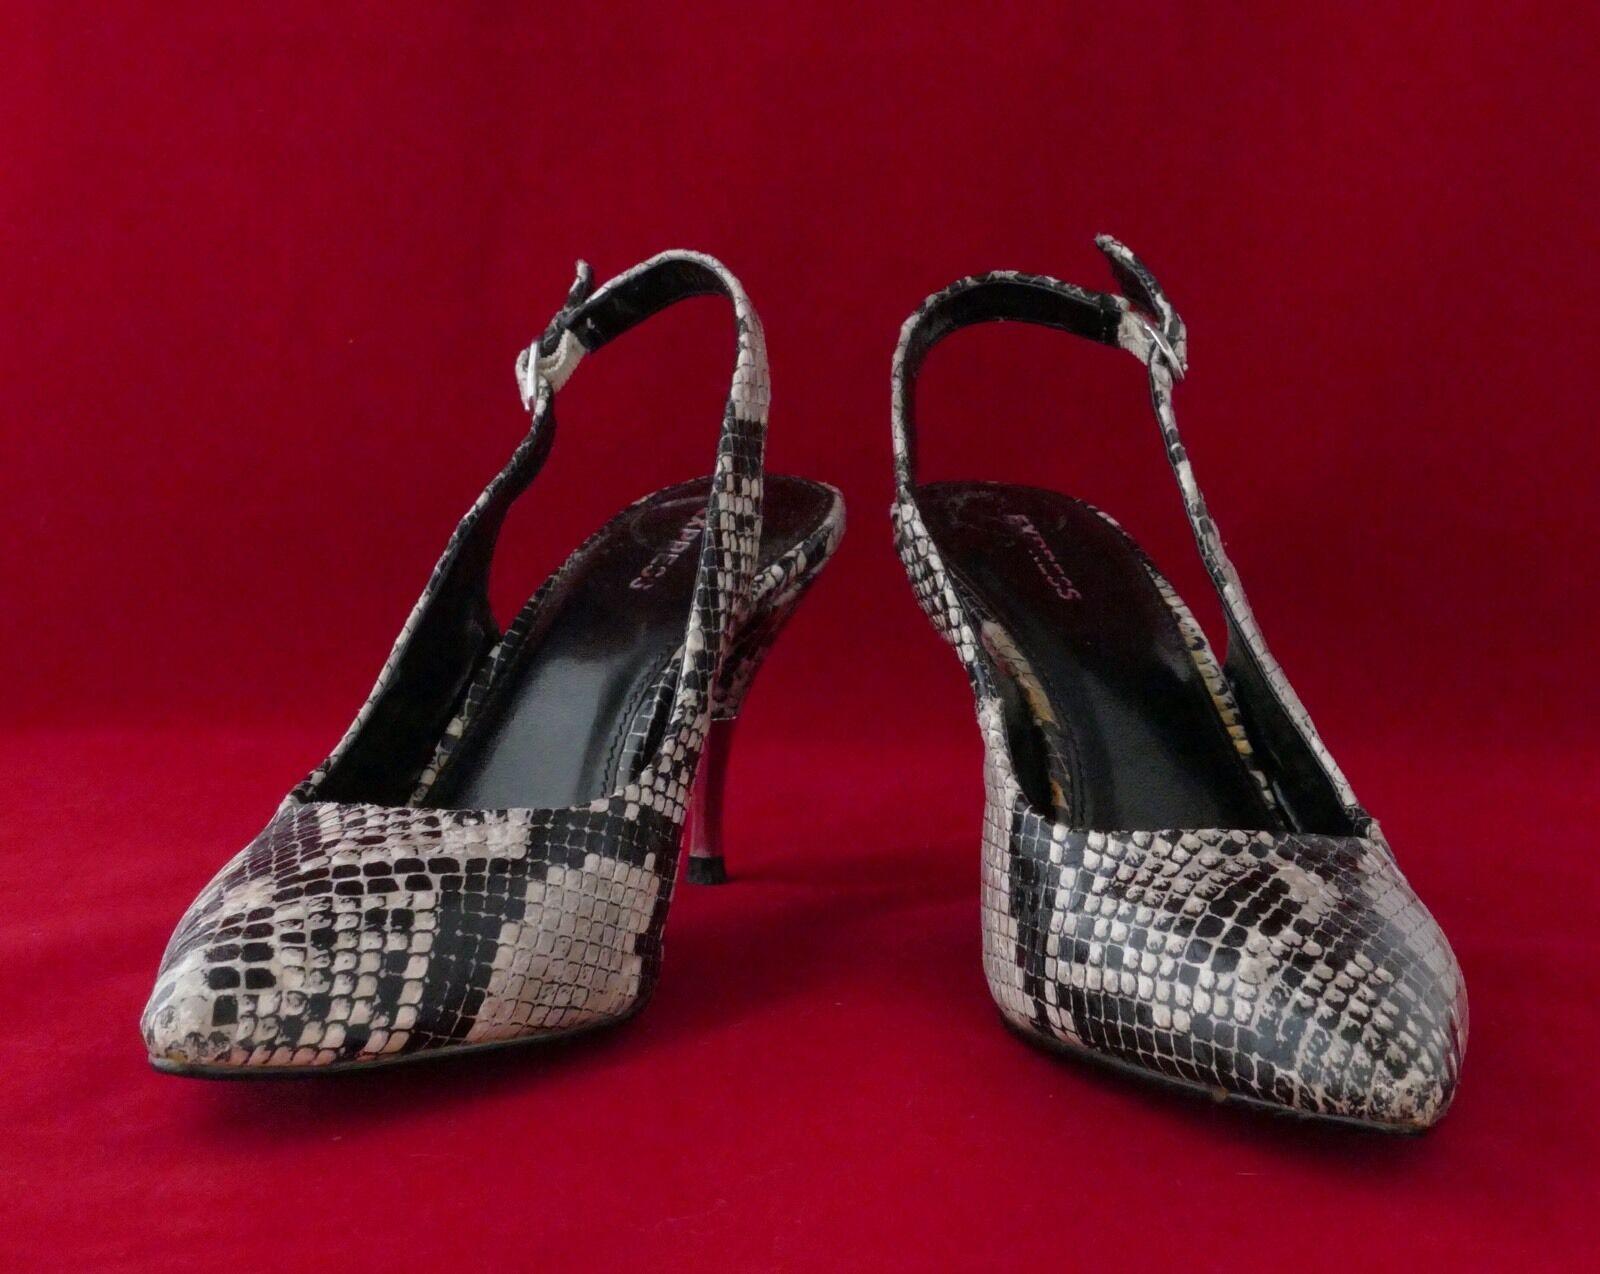 Express Women's Ladies Shoes Pump Crocodile Design Sling Back Size 6 Medium